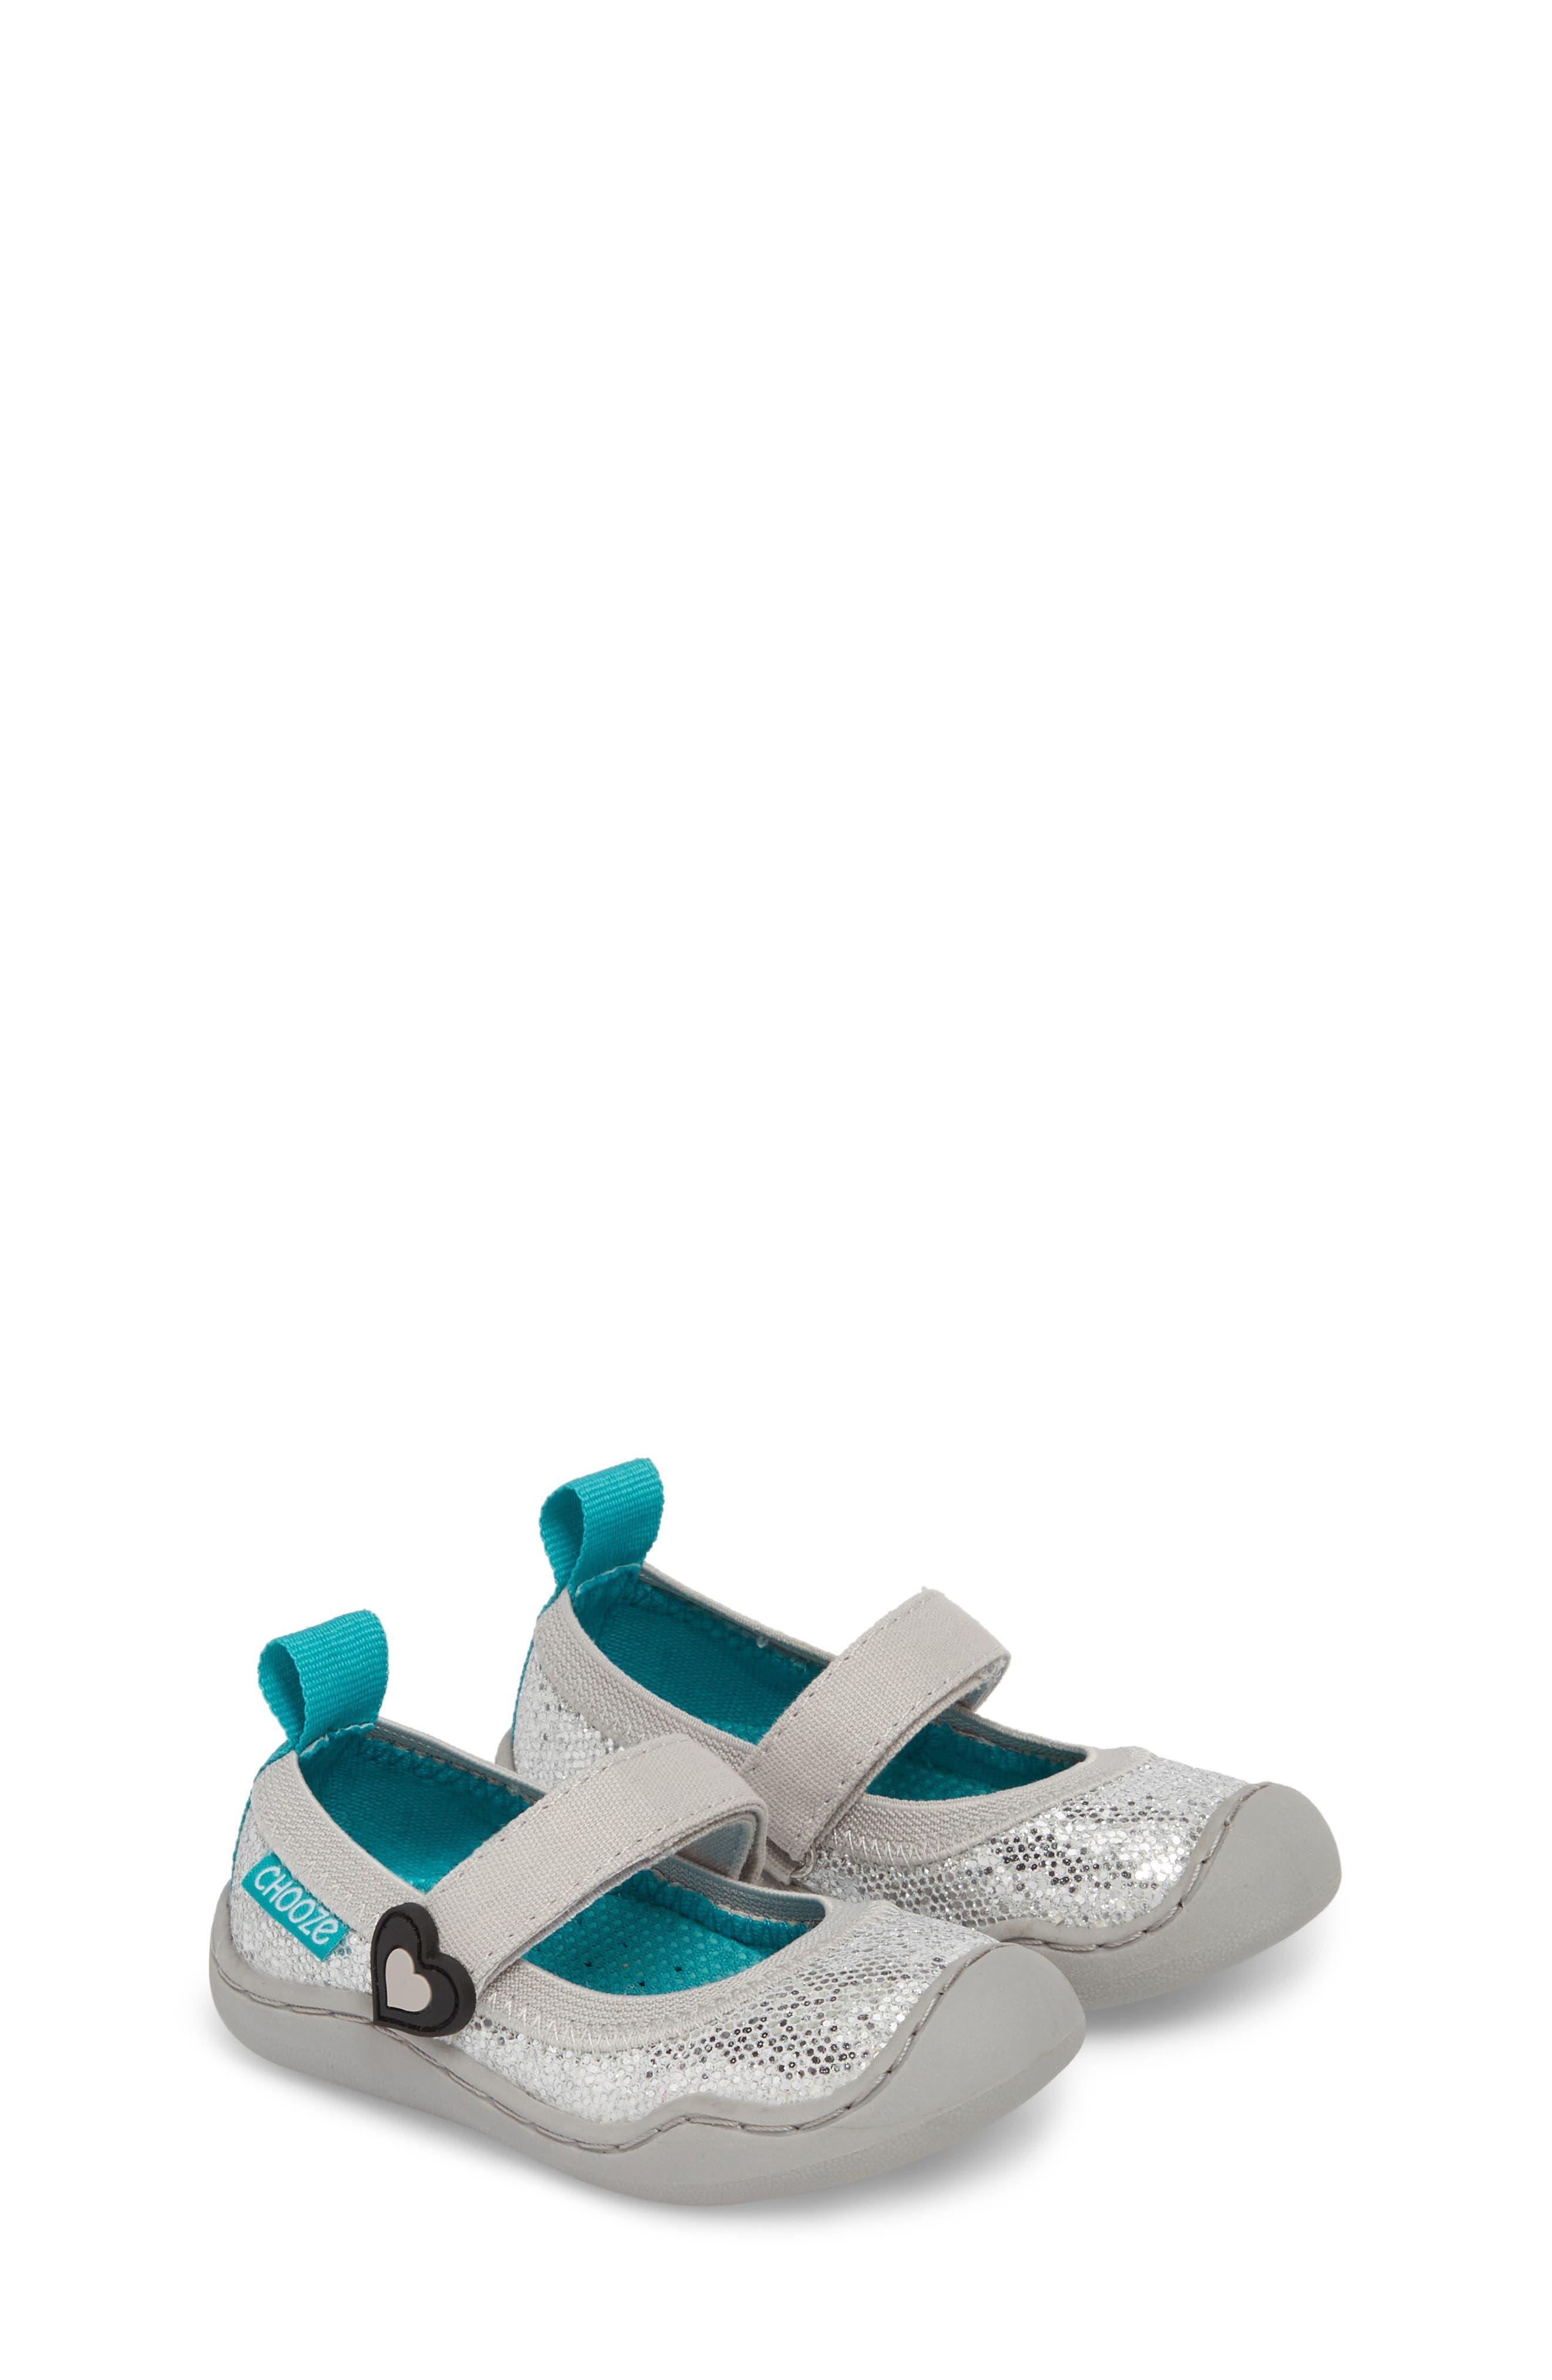 CHOOZE, Steady Shimmer Mary Jane Sneaker, Alternate thumbnail 2, color, GLOW PLATINUM